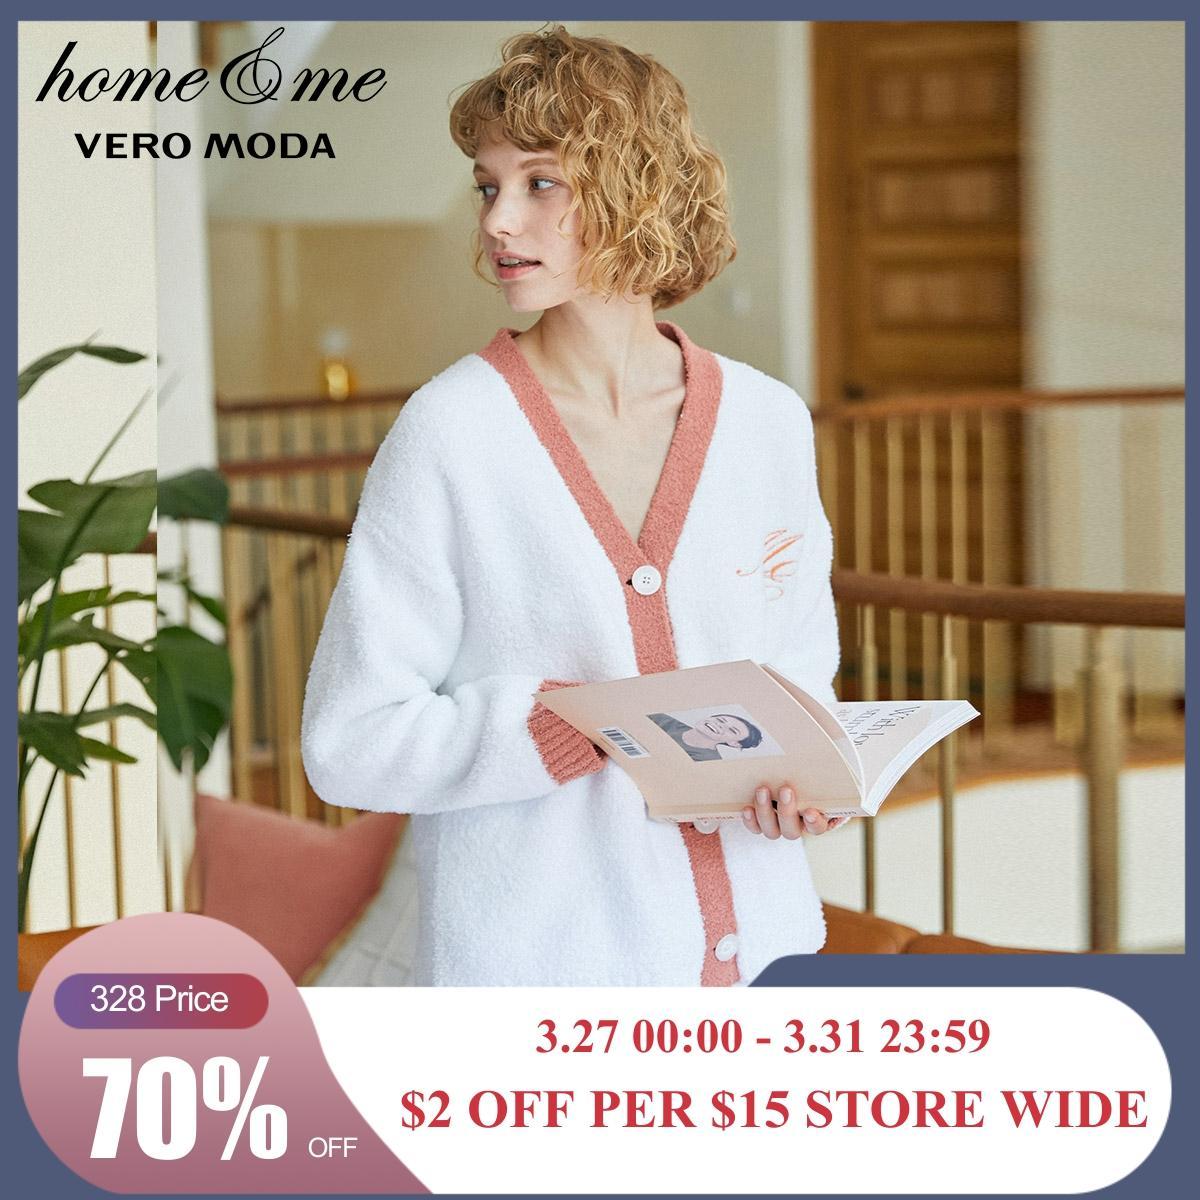 Vero Moda Women's Long-sleeves Two-piece Knitted Cardigan Suit Homewear Pajamas Set   3194K6510